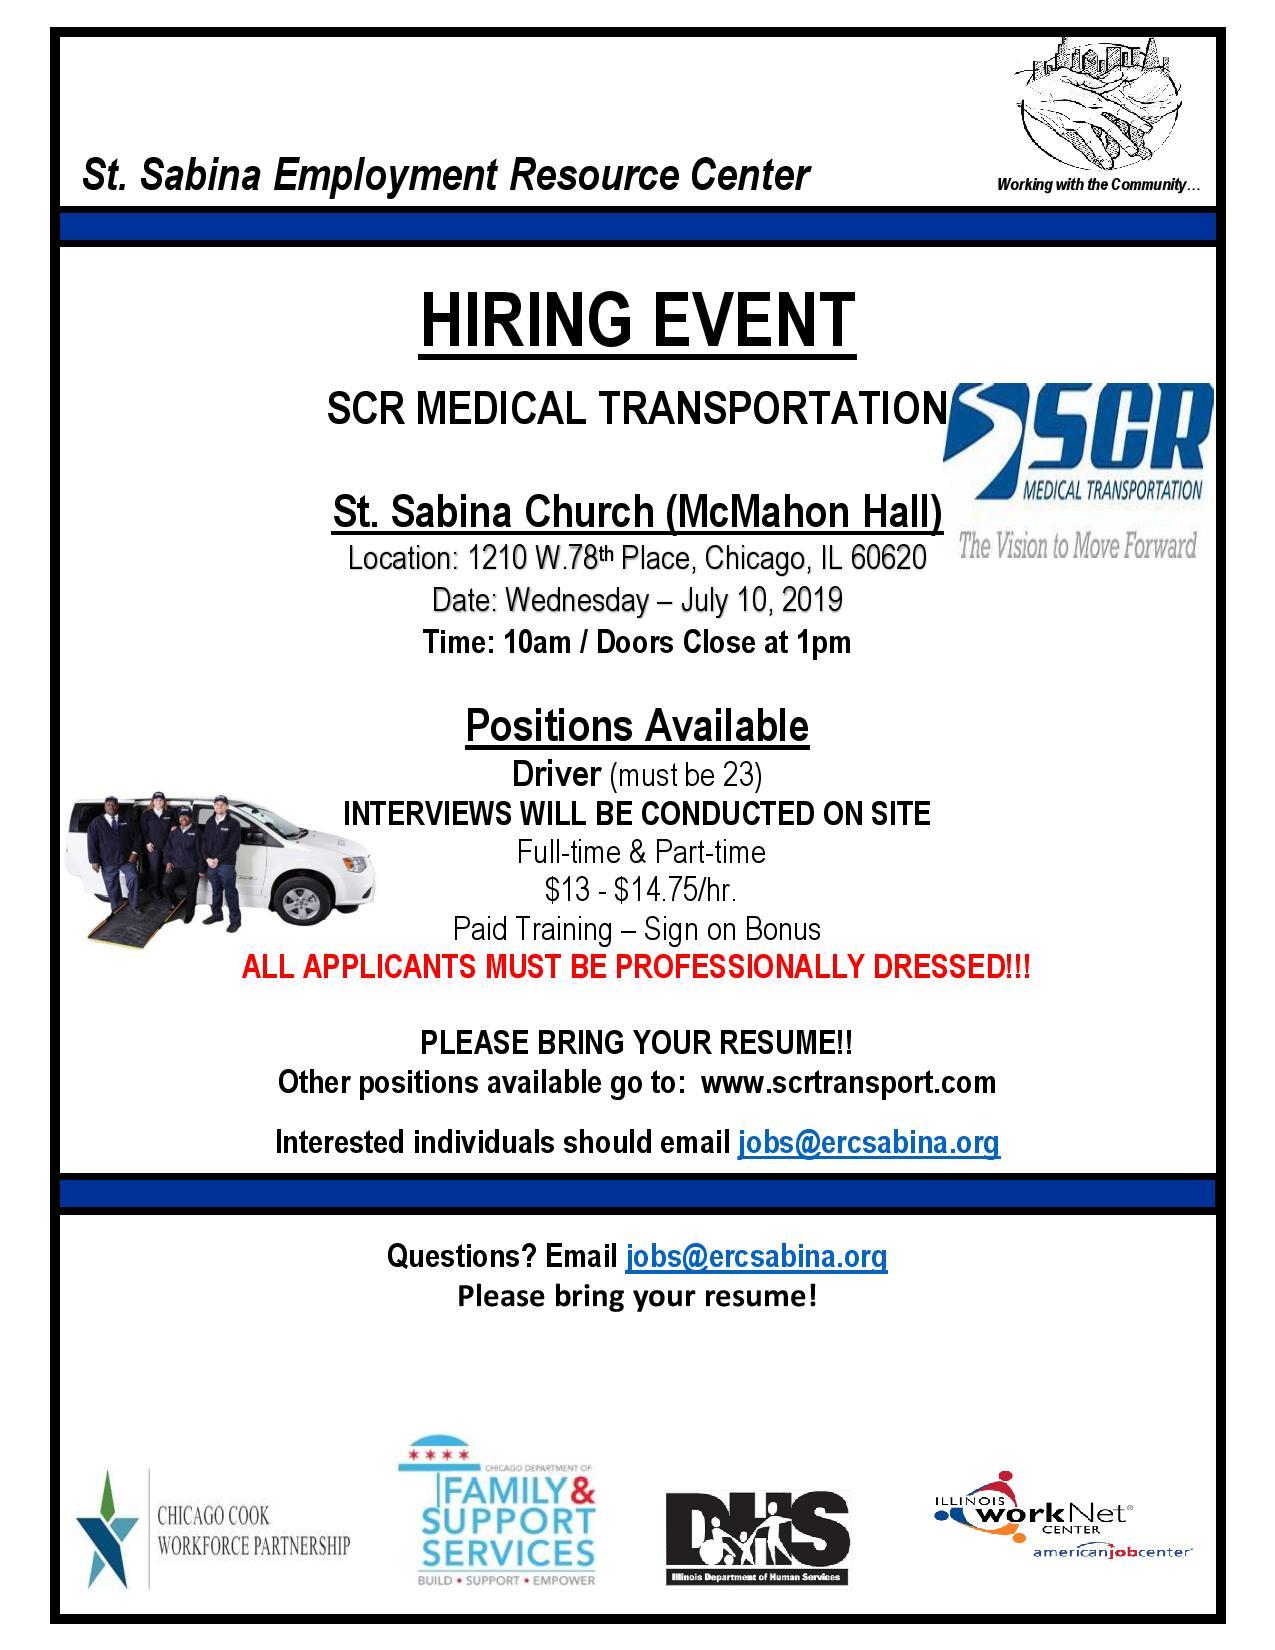 07-10-2019 SCR Medical Transportation Hiring Event-page-001.jpg